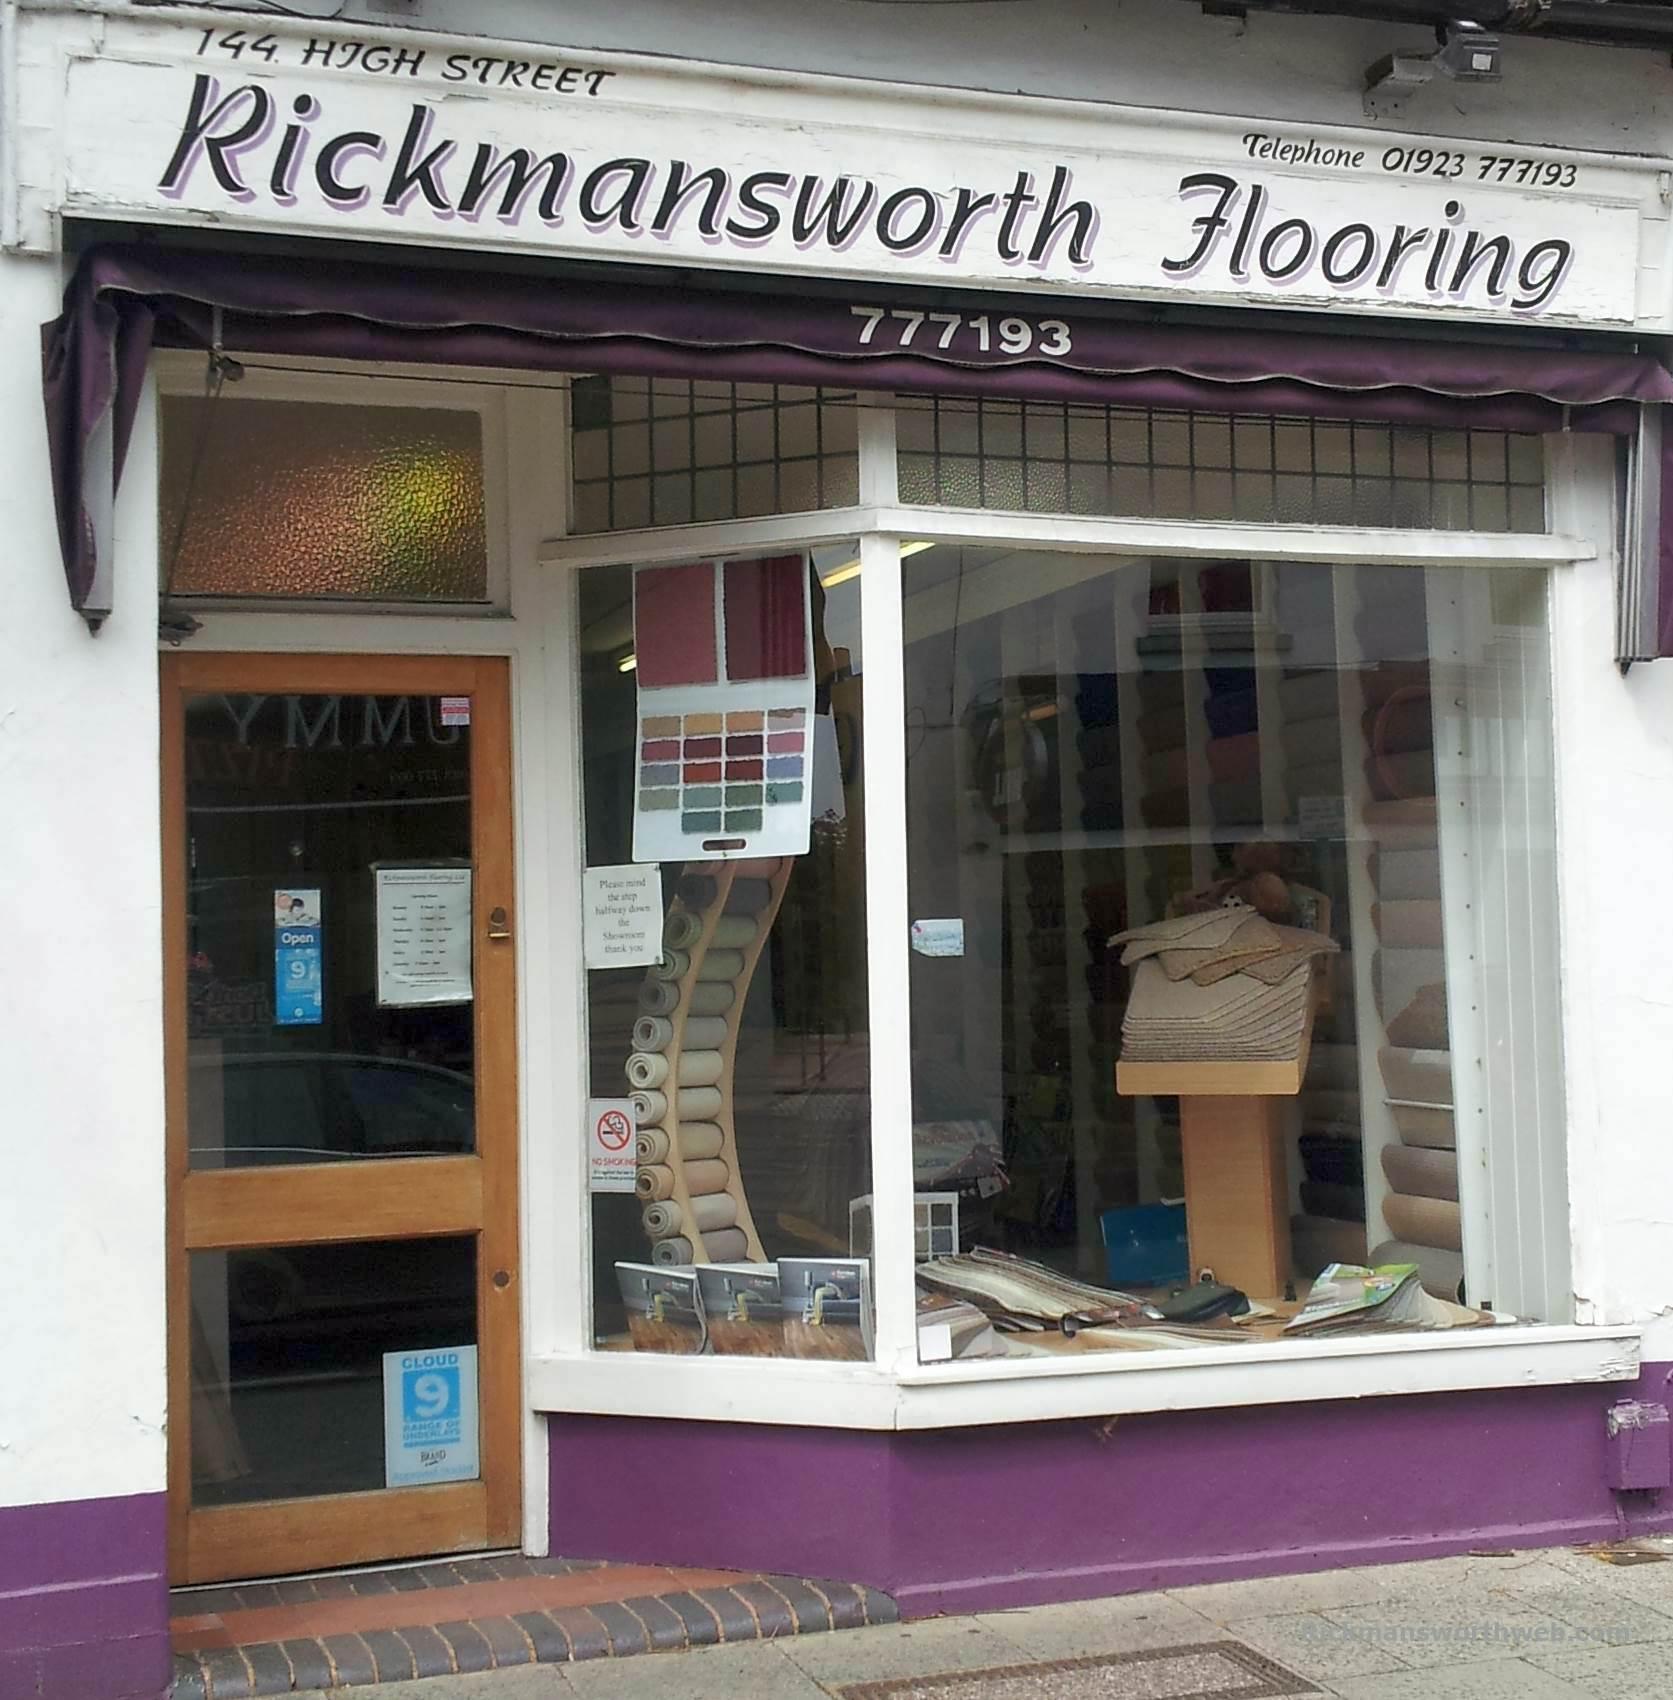 Rickmansworth Flooring June 2013